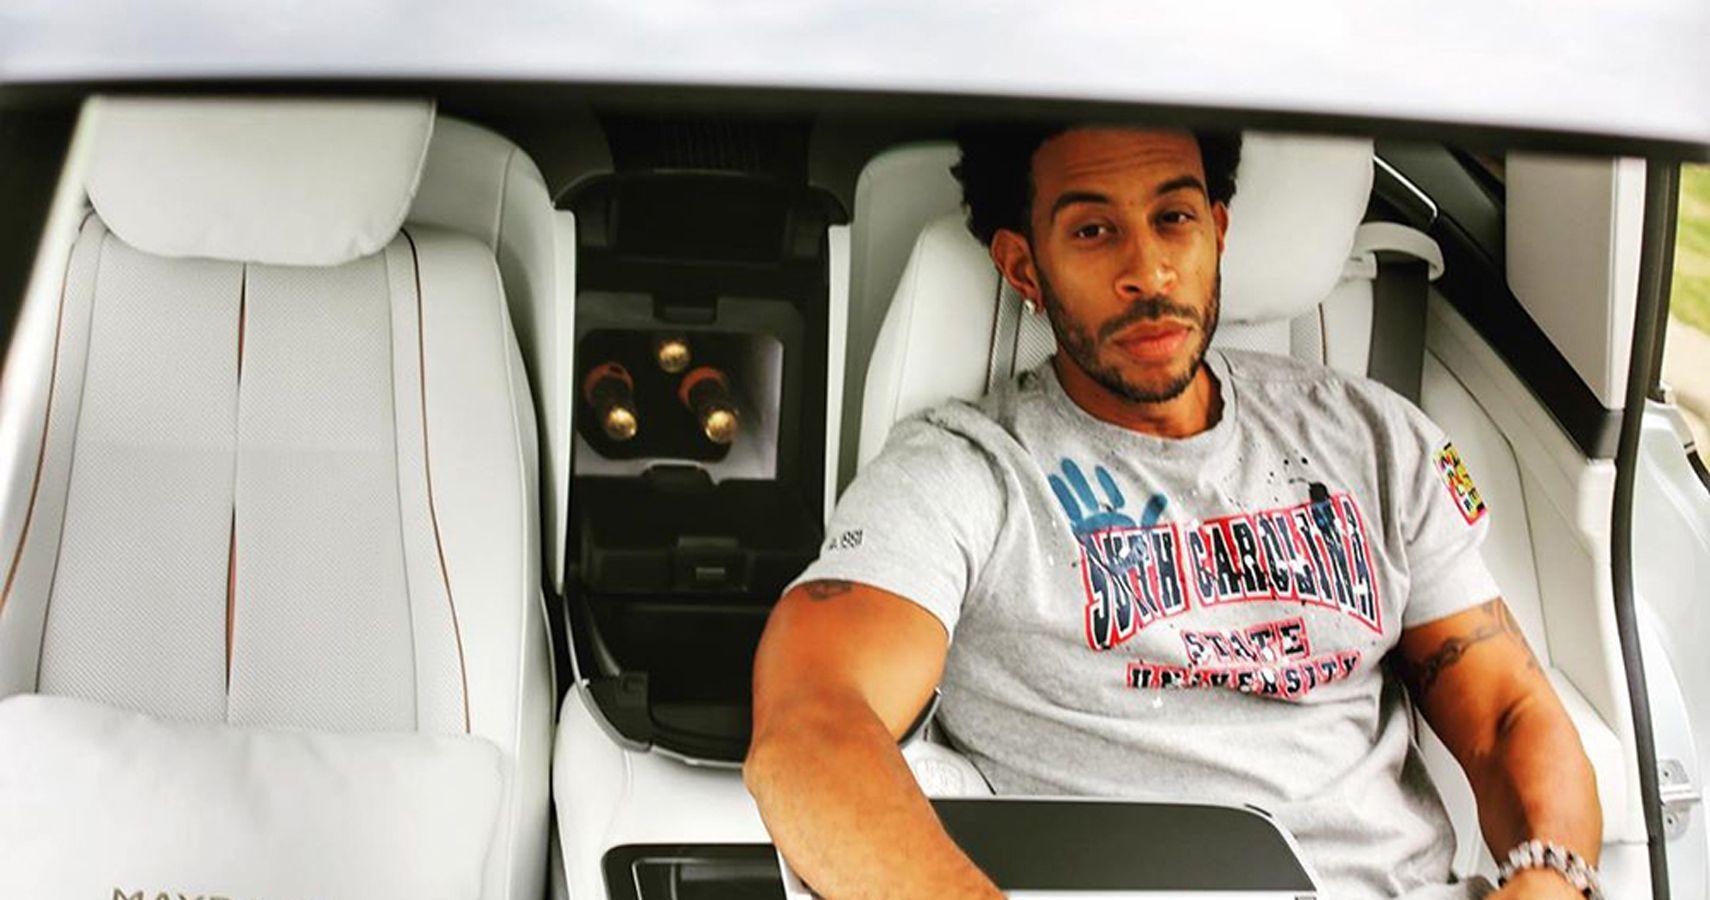 Ludacris Seen (Literally) Rocking His Mercedes-Maybach on Instagram